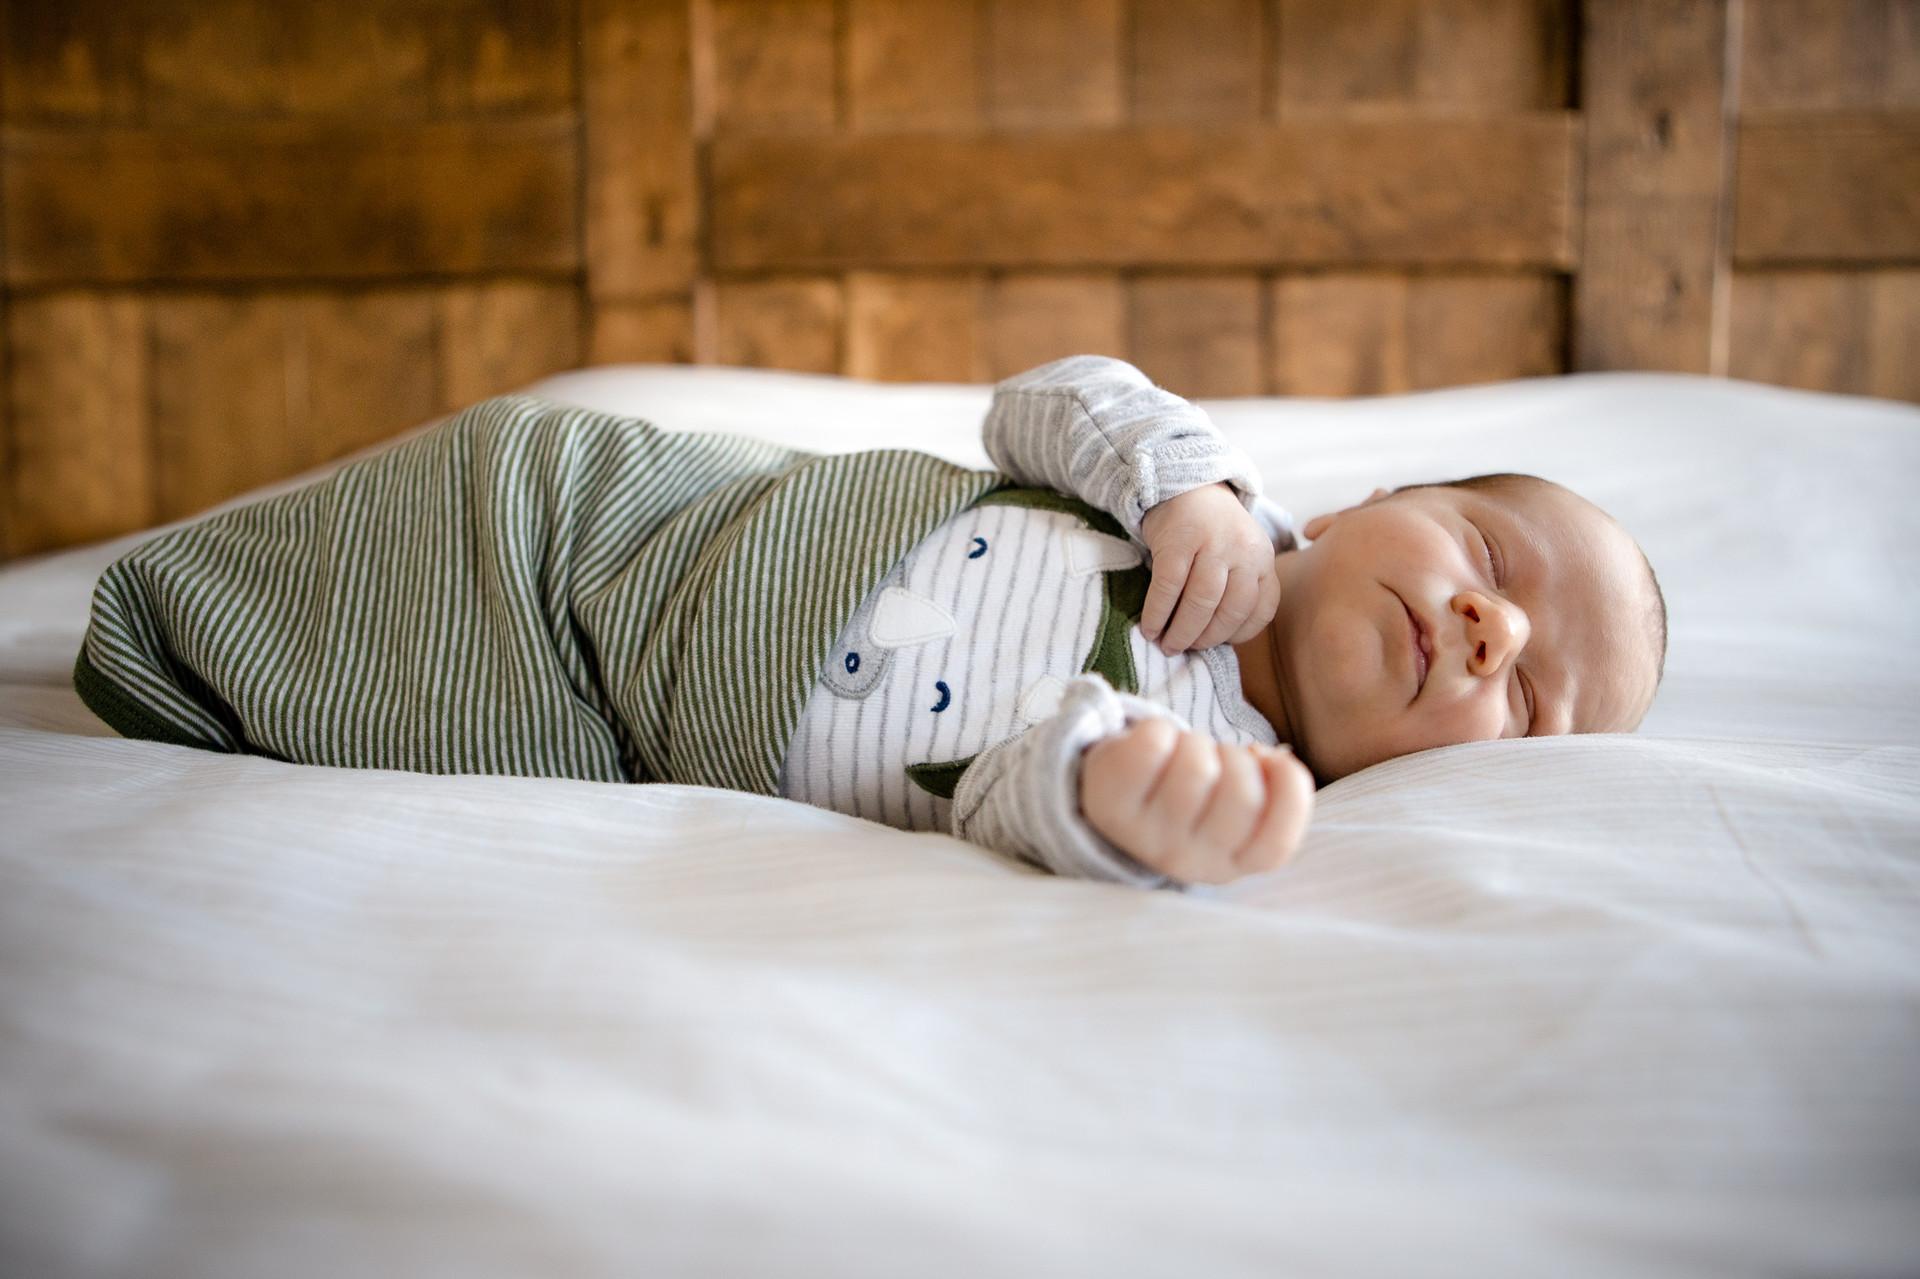 Nixx_Photography_Newborn_Emmett_Low_Res-